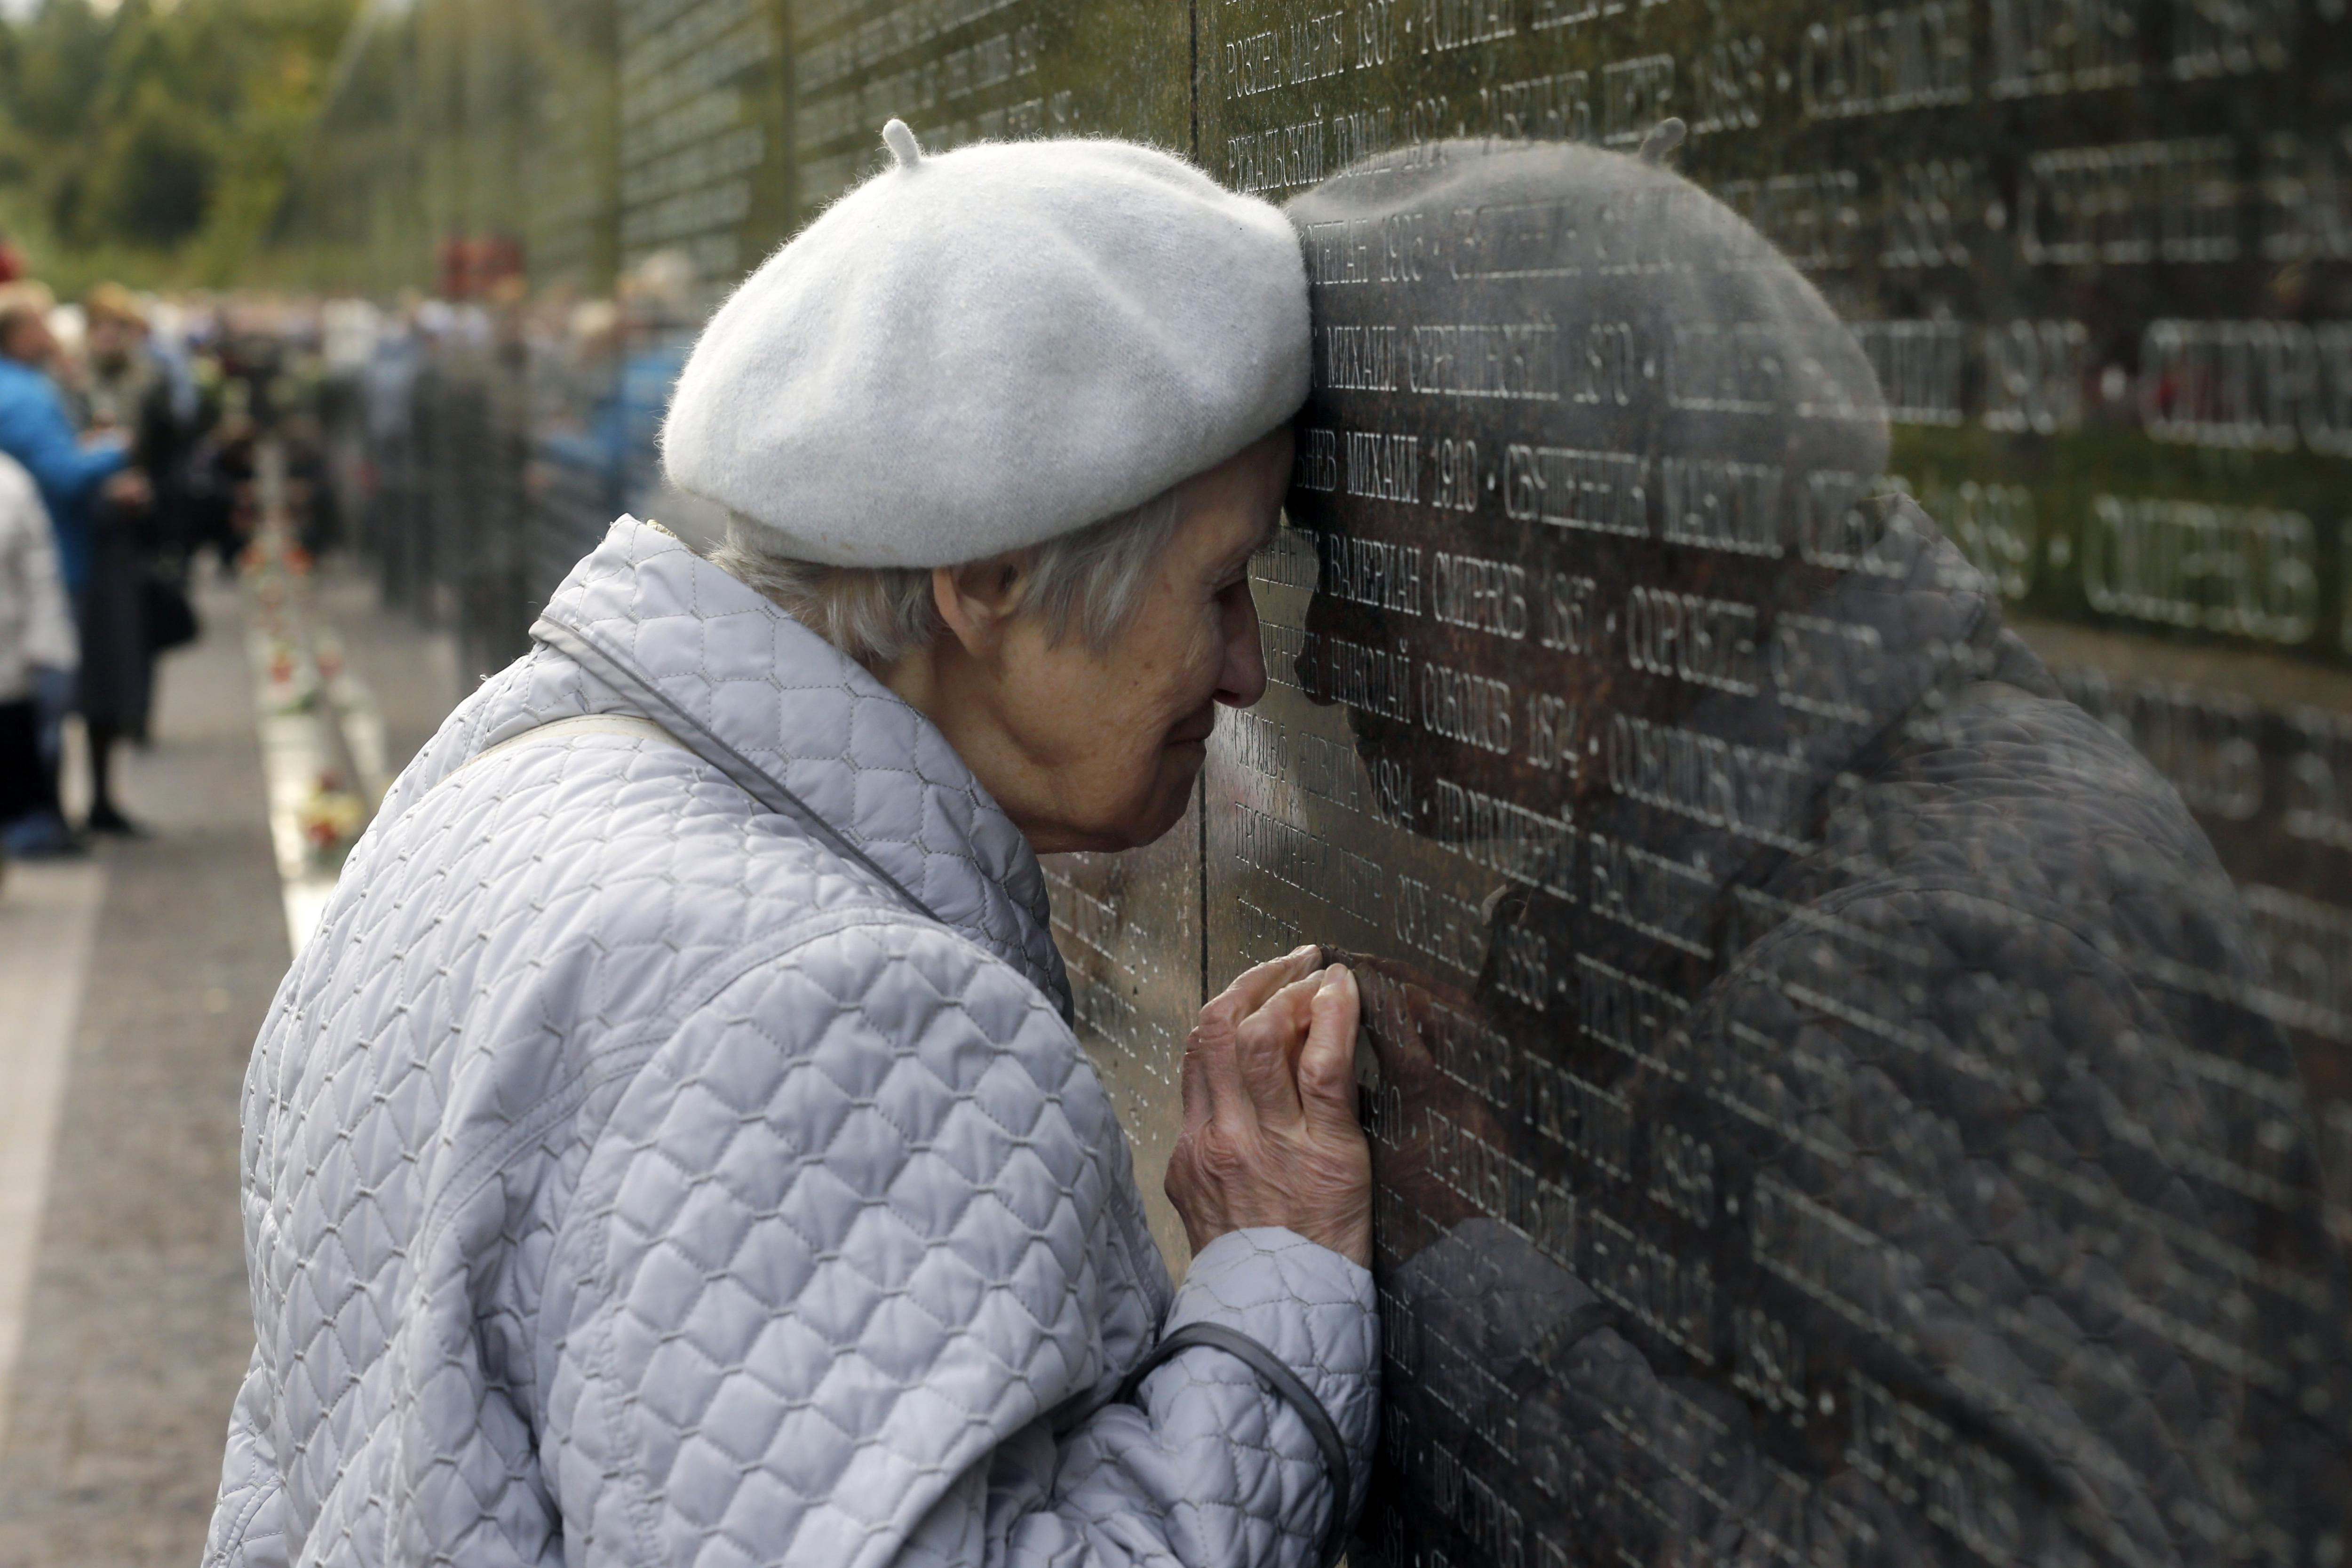 Una dona russa acaricia el nom del seu avi en un monument commemoratiu en el camp de tir de Bútovo, a Moscou, Rússia. /SERGEI CHIRIKOV